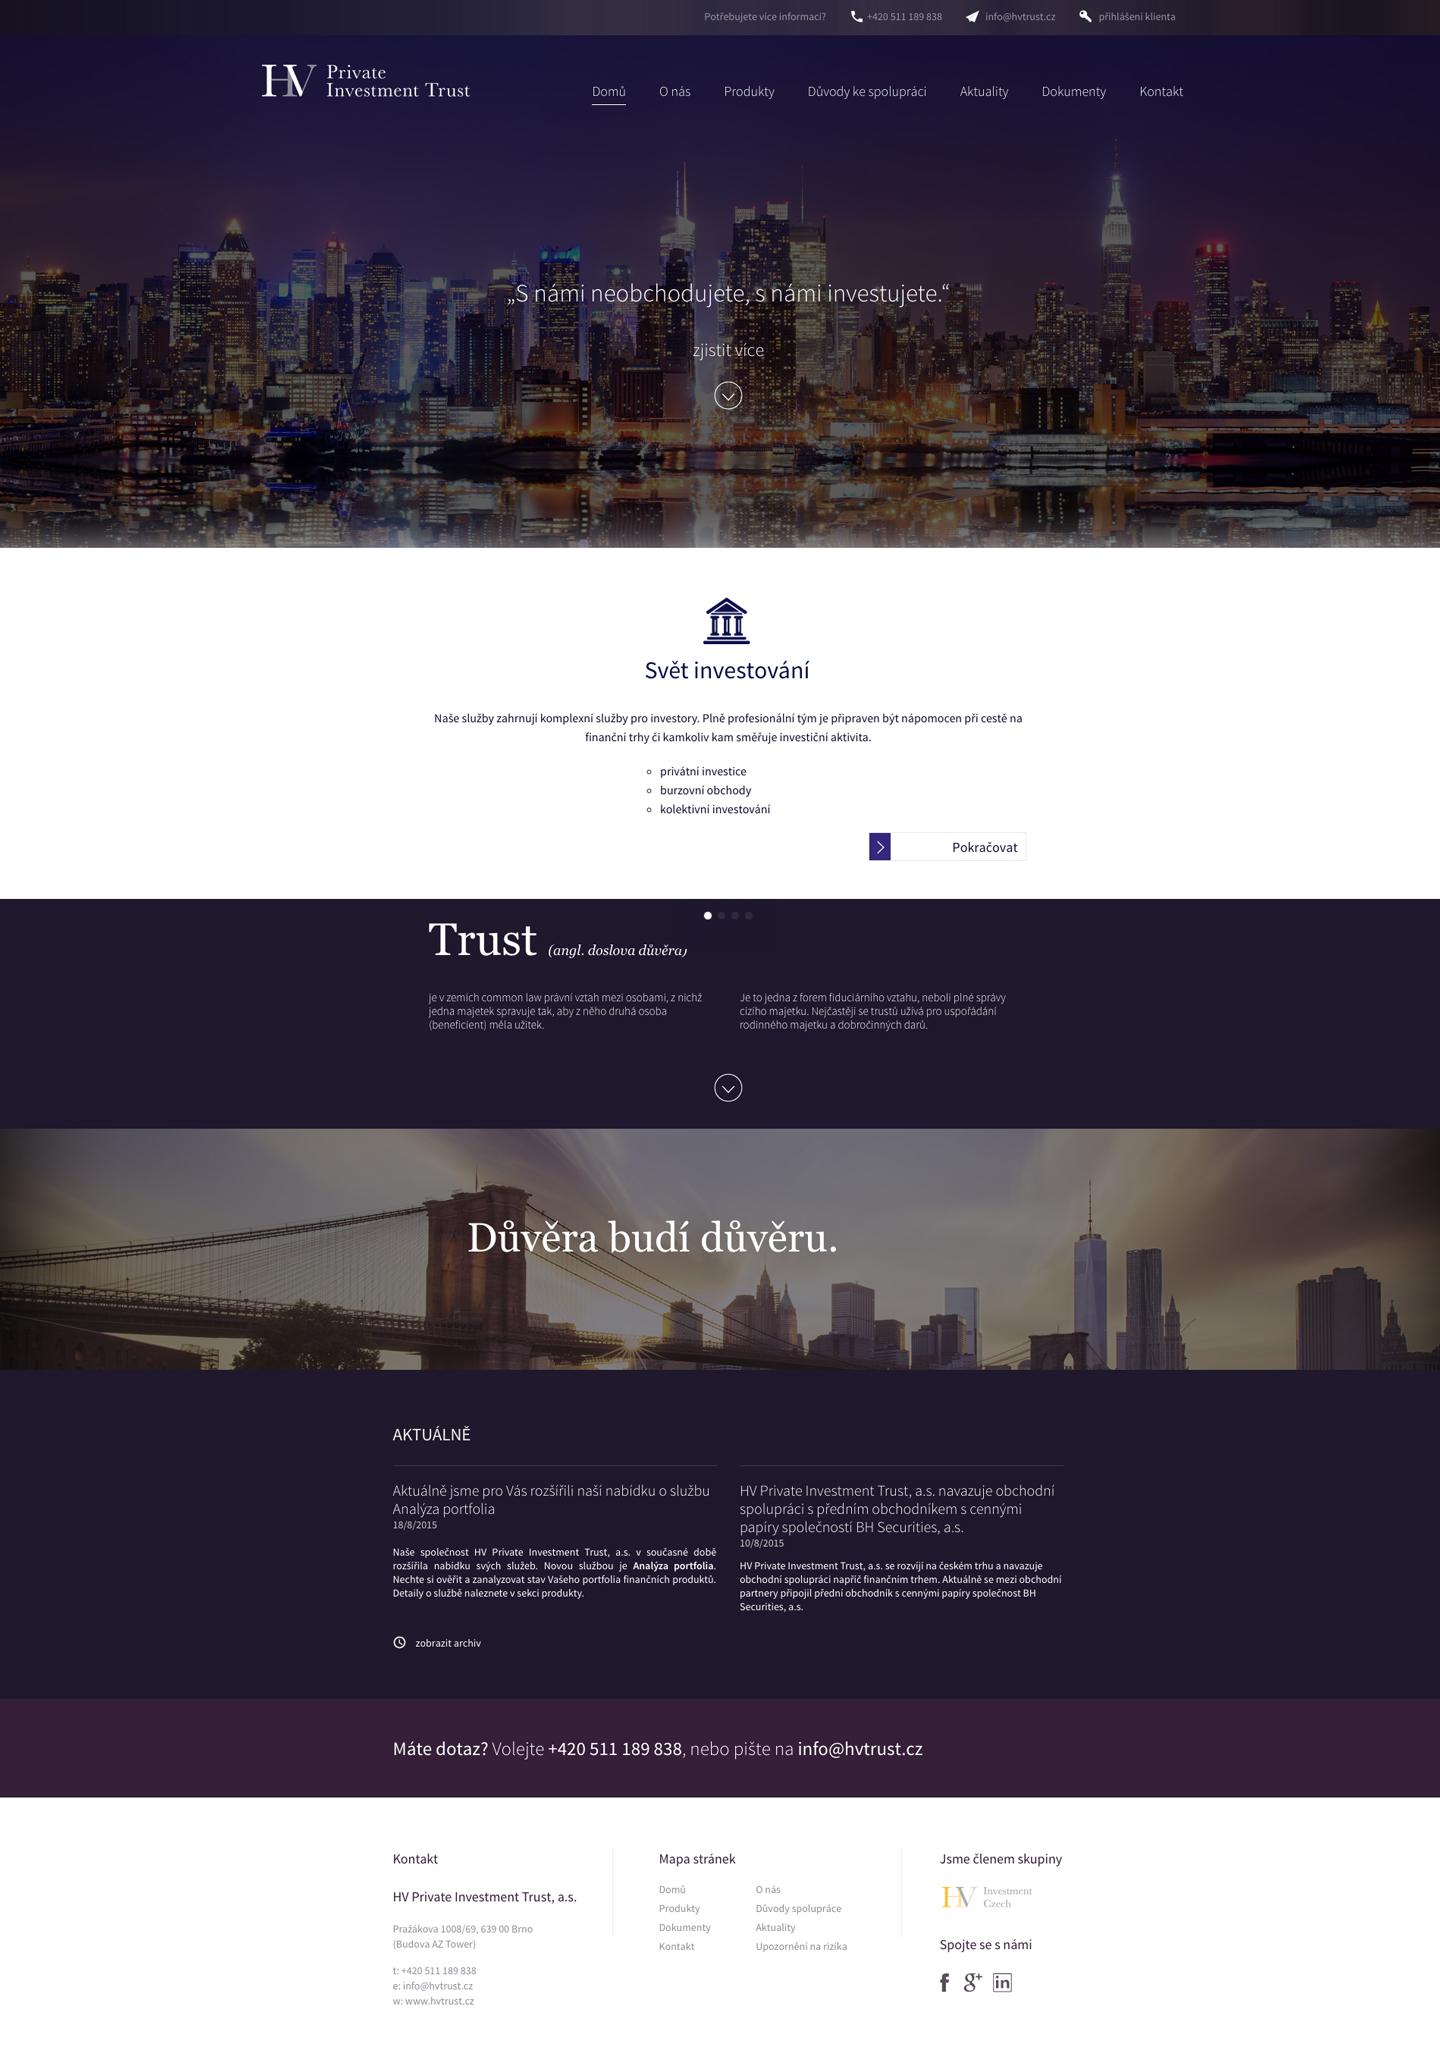 HV Private Investment Trust - realizace, Webdesign